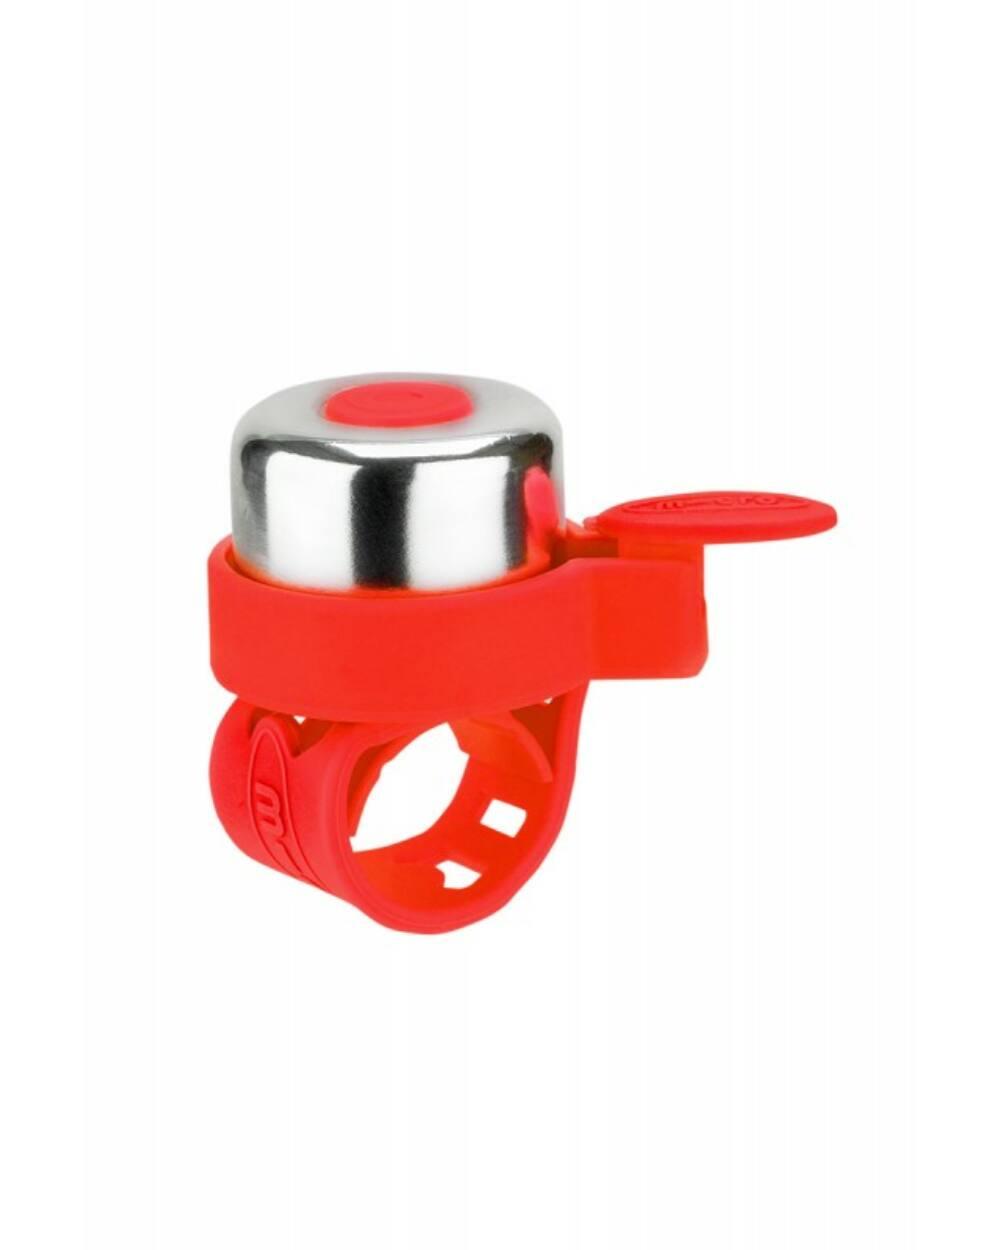 Micro roller csengő, piros